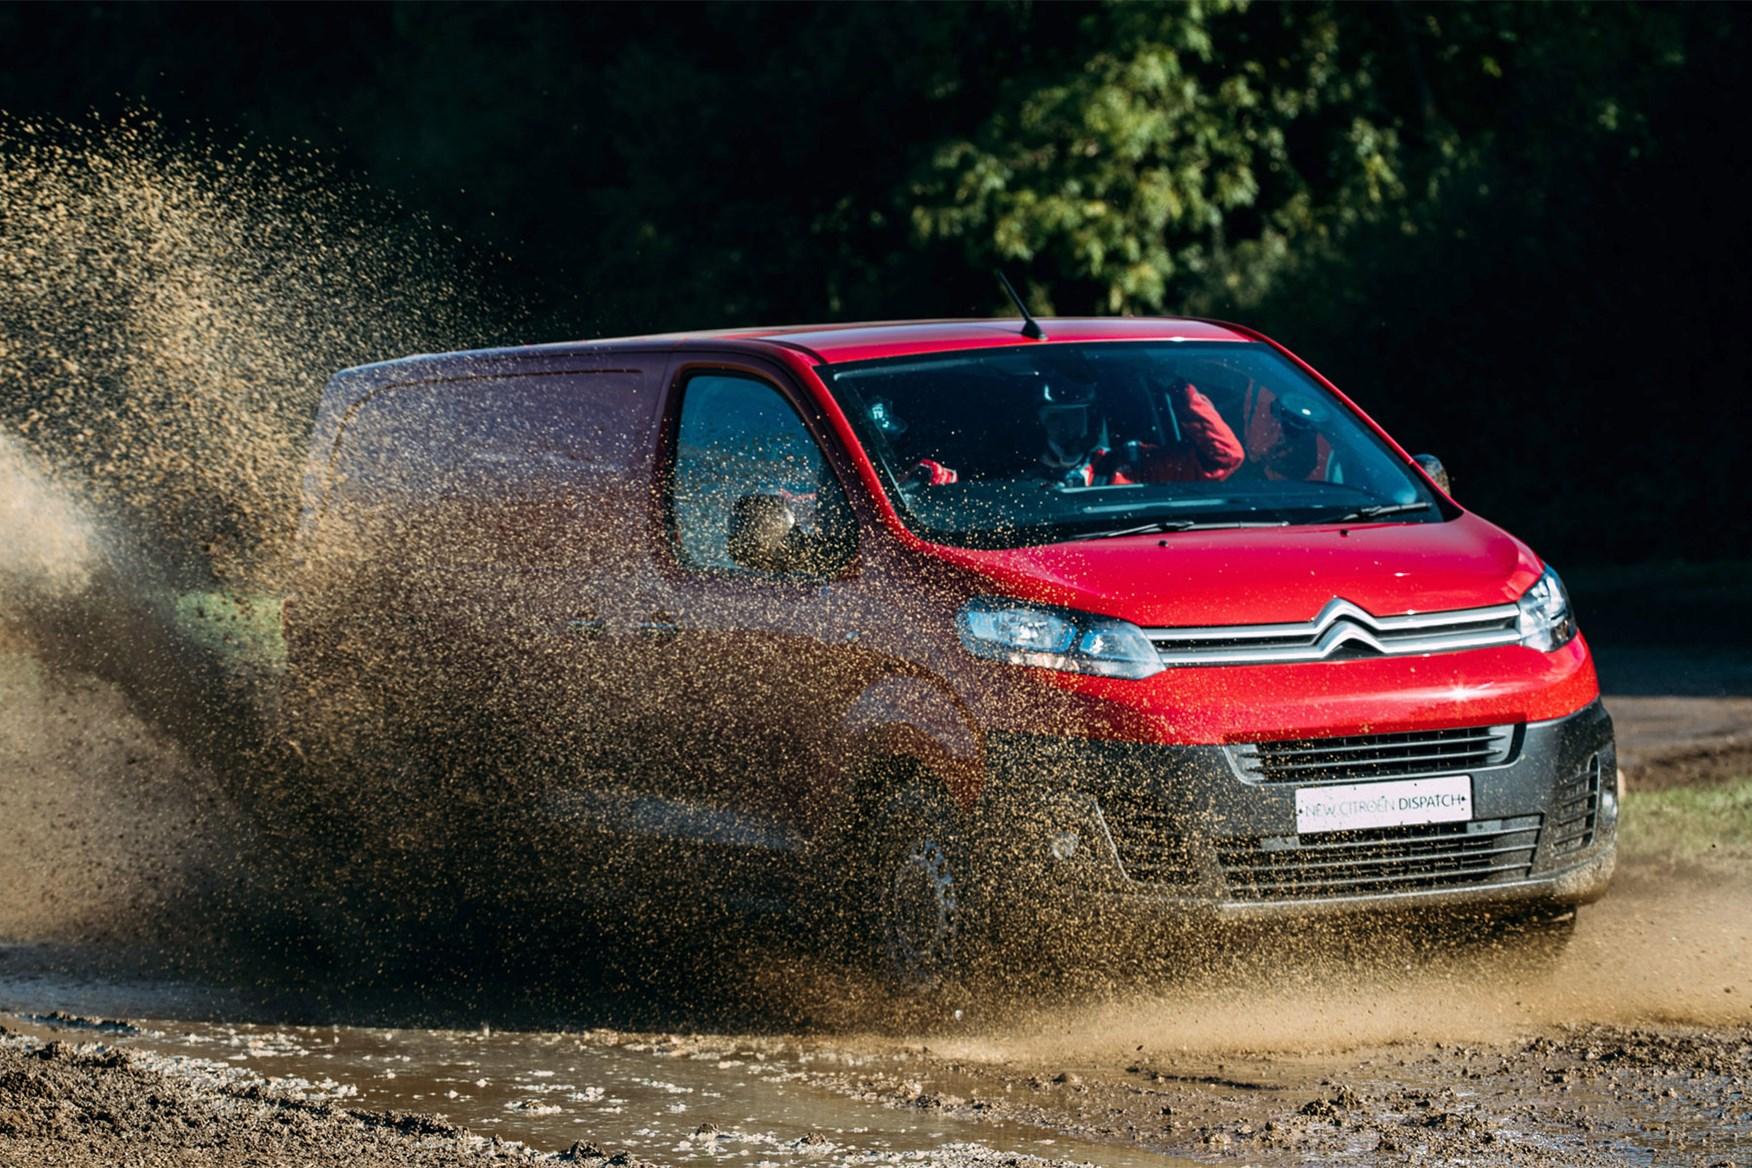 Citroen Dispatch review - front view, red, splashing through mud